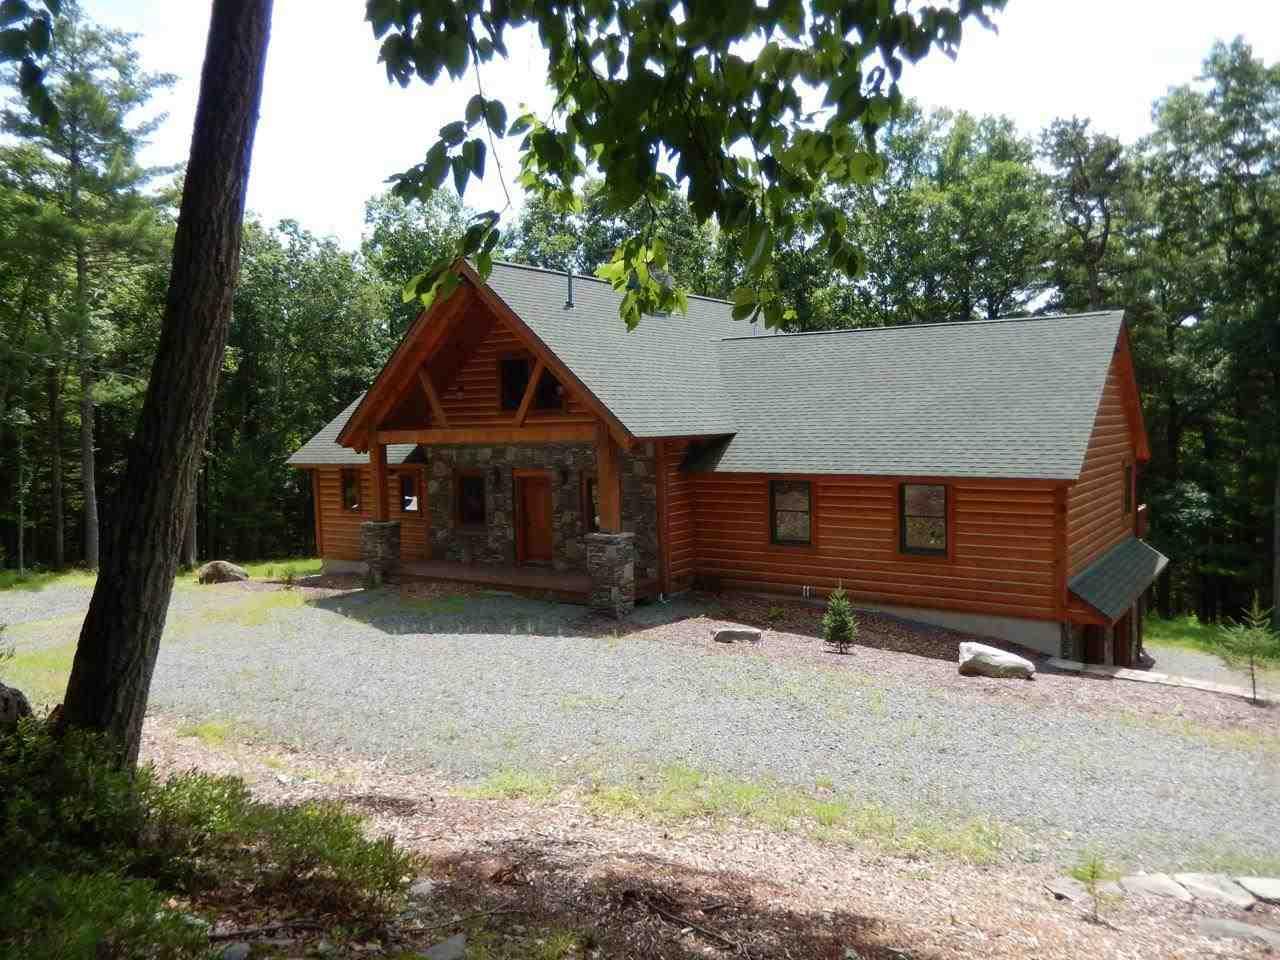 Real Estate for Sale, ListingId: 31768352, Glen Spey,NY12737